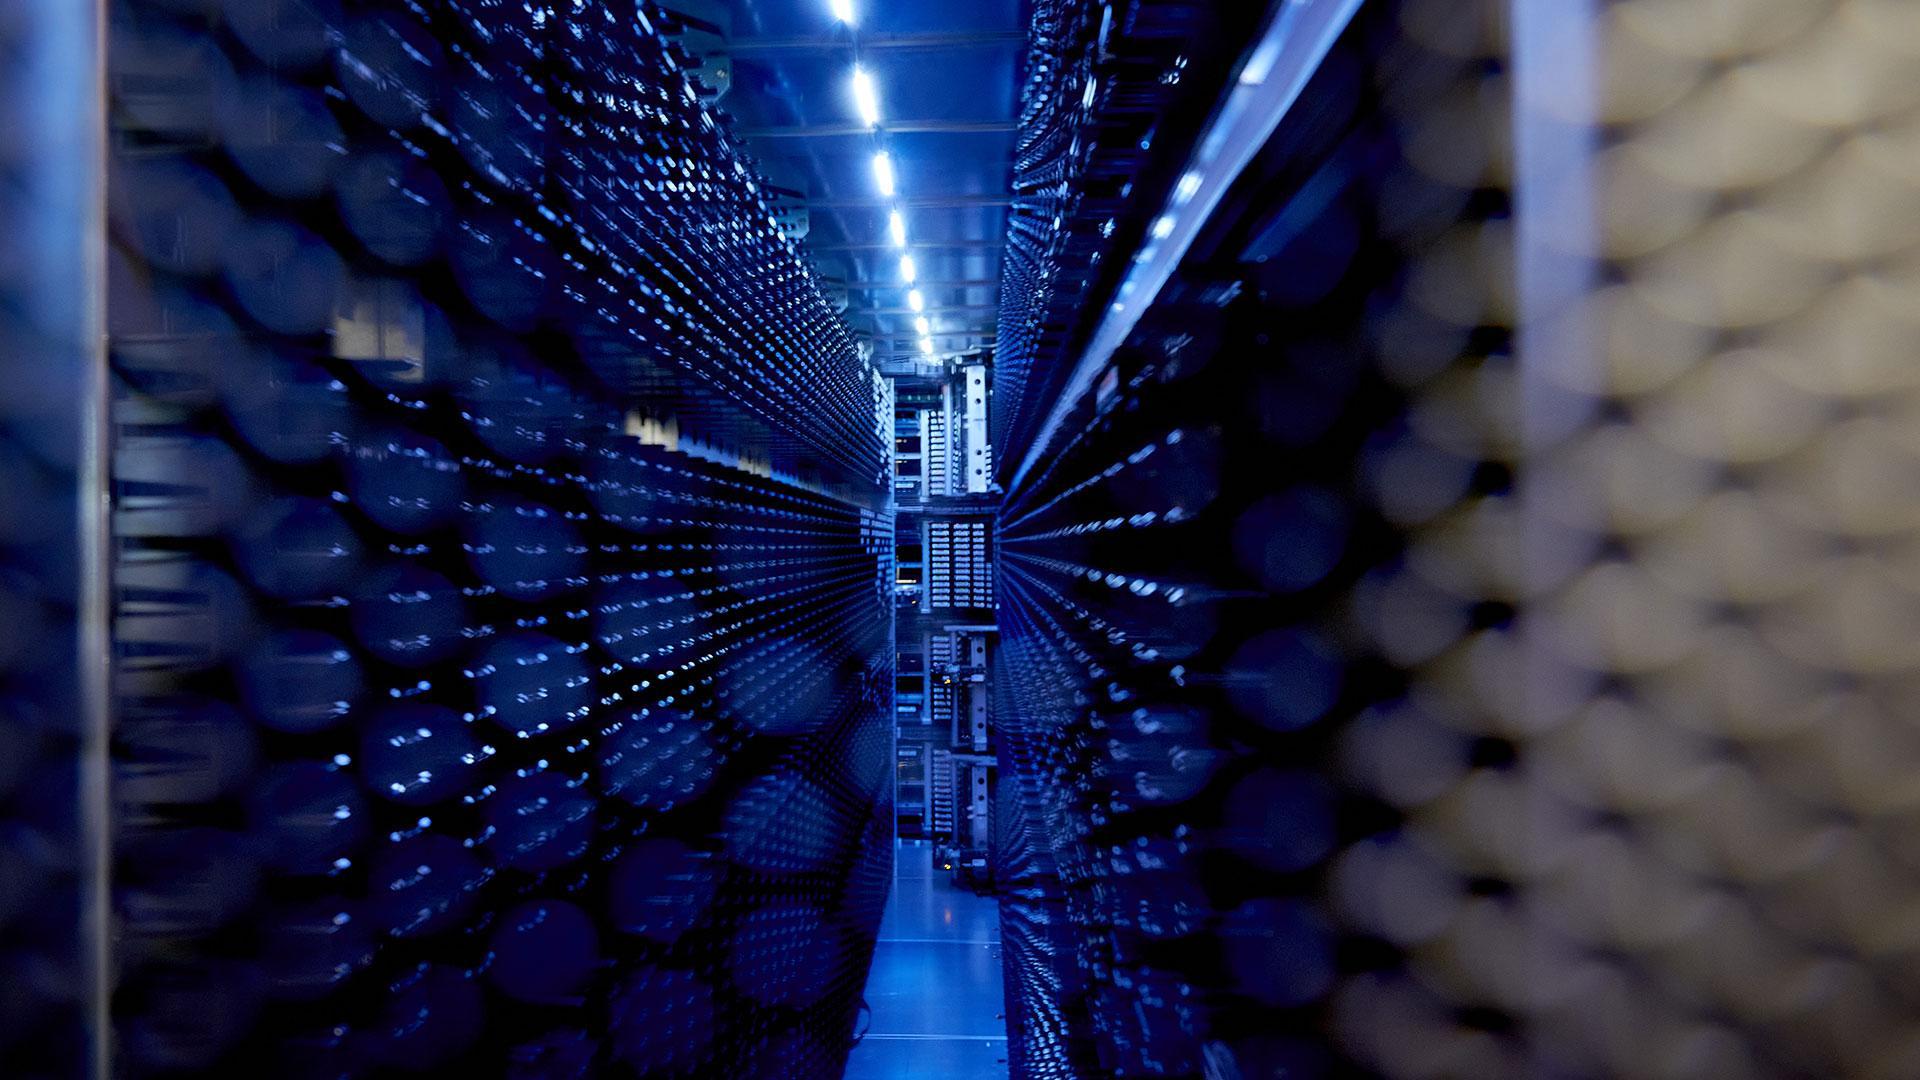 EUMETSAT Data Centre